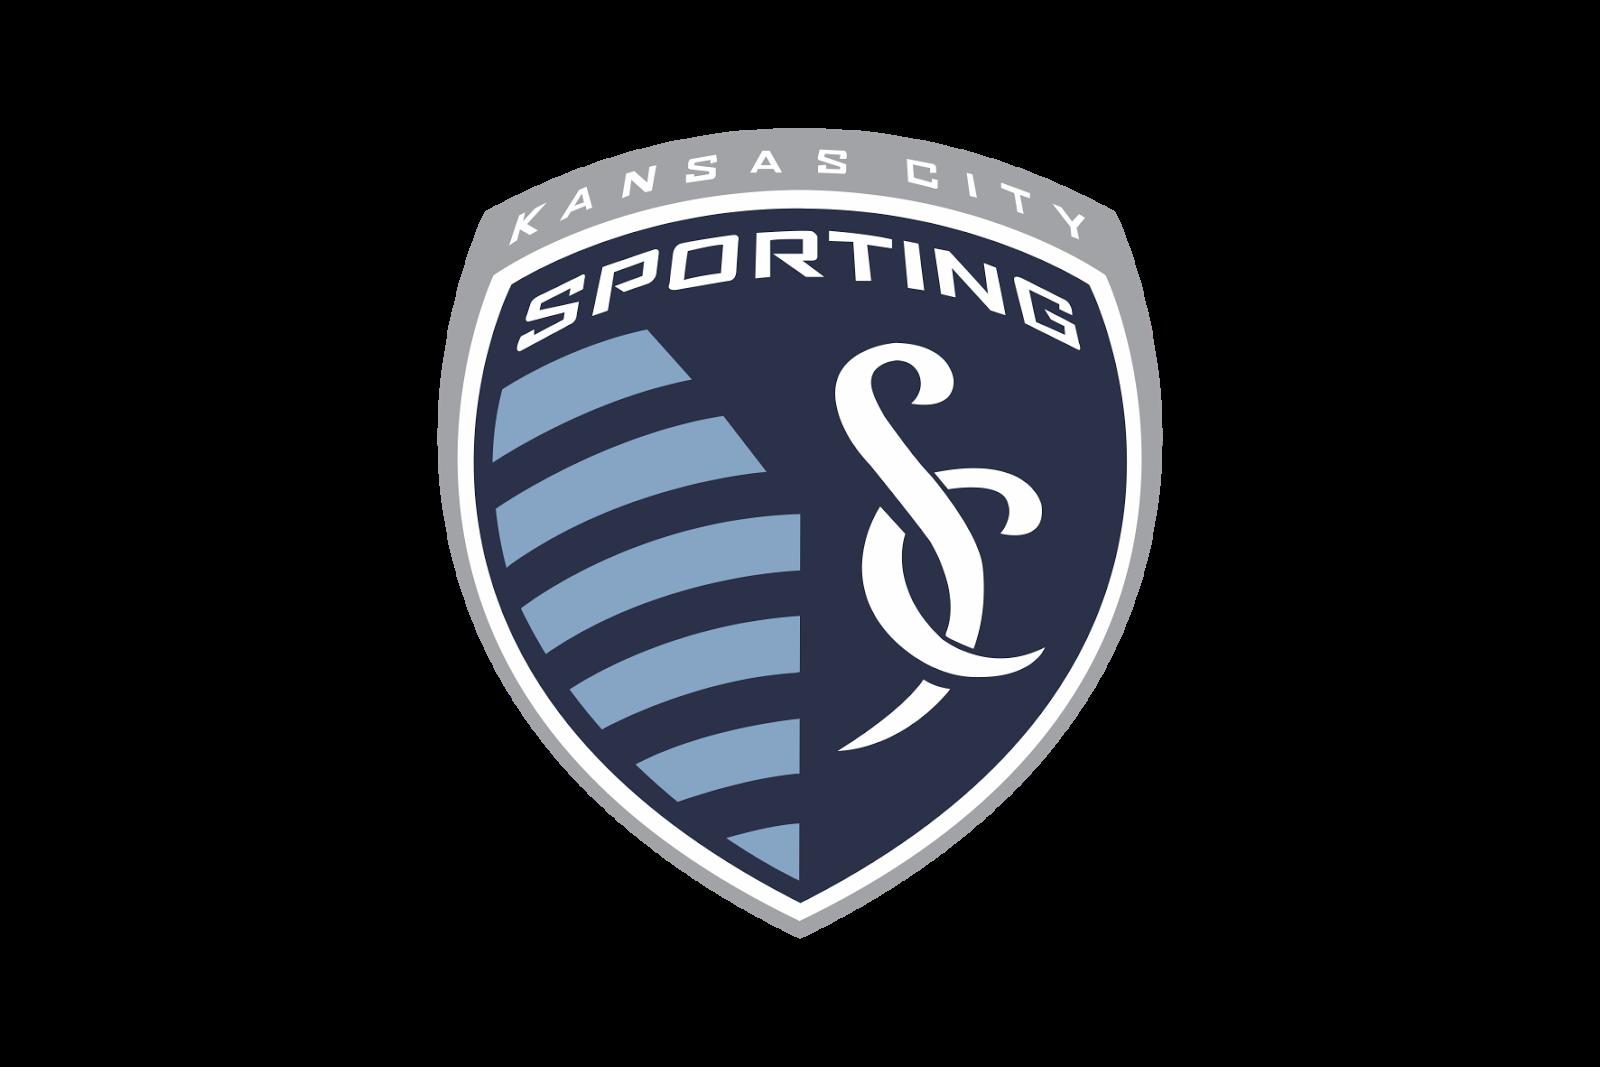 Logo Sporting Kansas City Png - Logo Sporting Kansas City Png Hdpng.com 1600, Transparent background PNG HD thumbnail